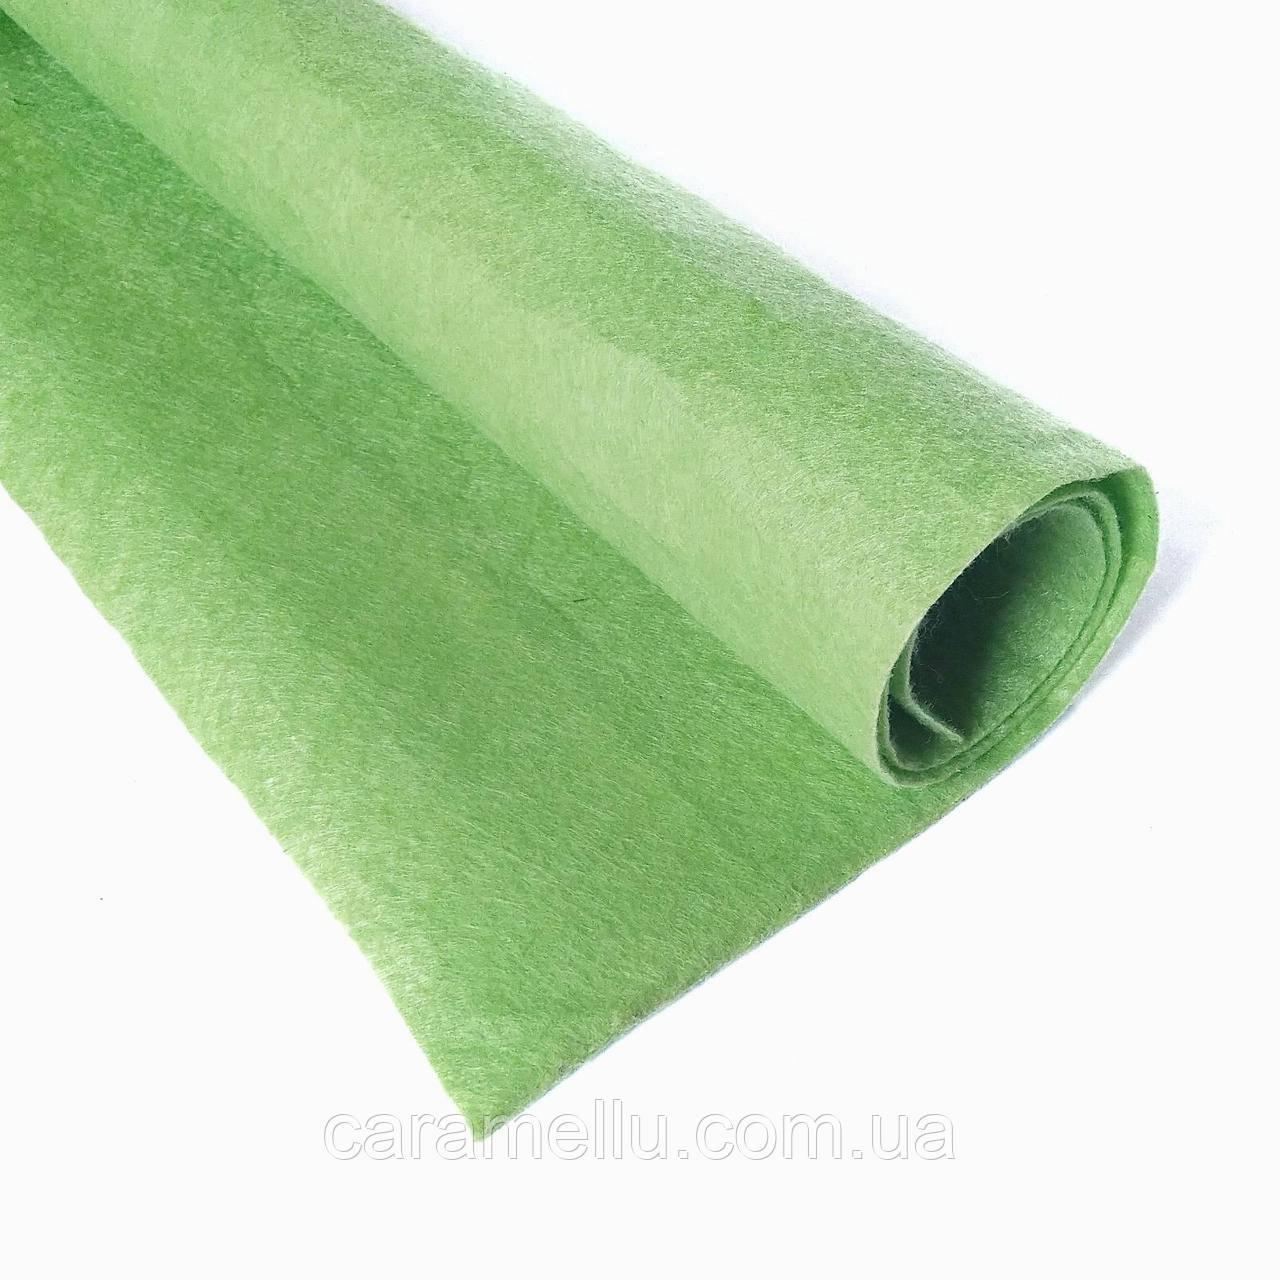 Фетр Светло-зеленый 1мм, 80х100см.